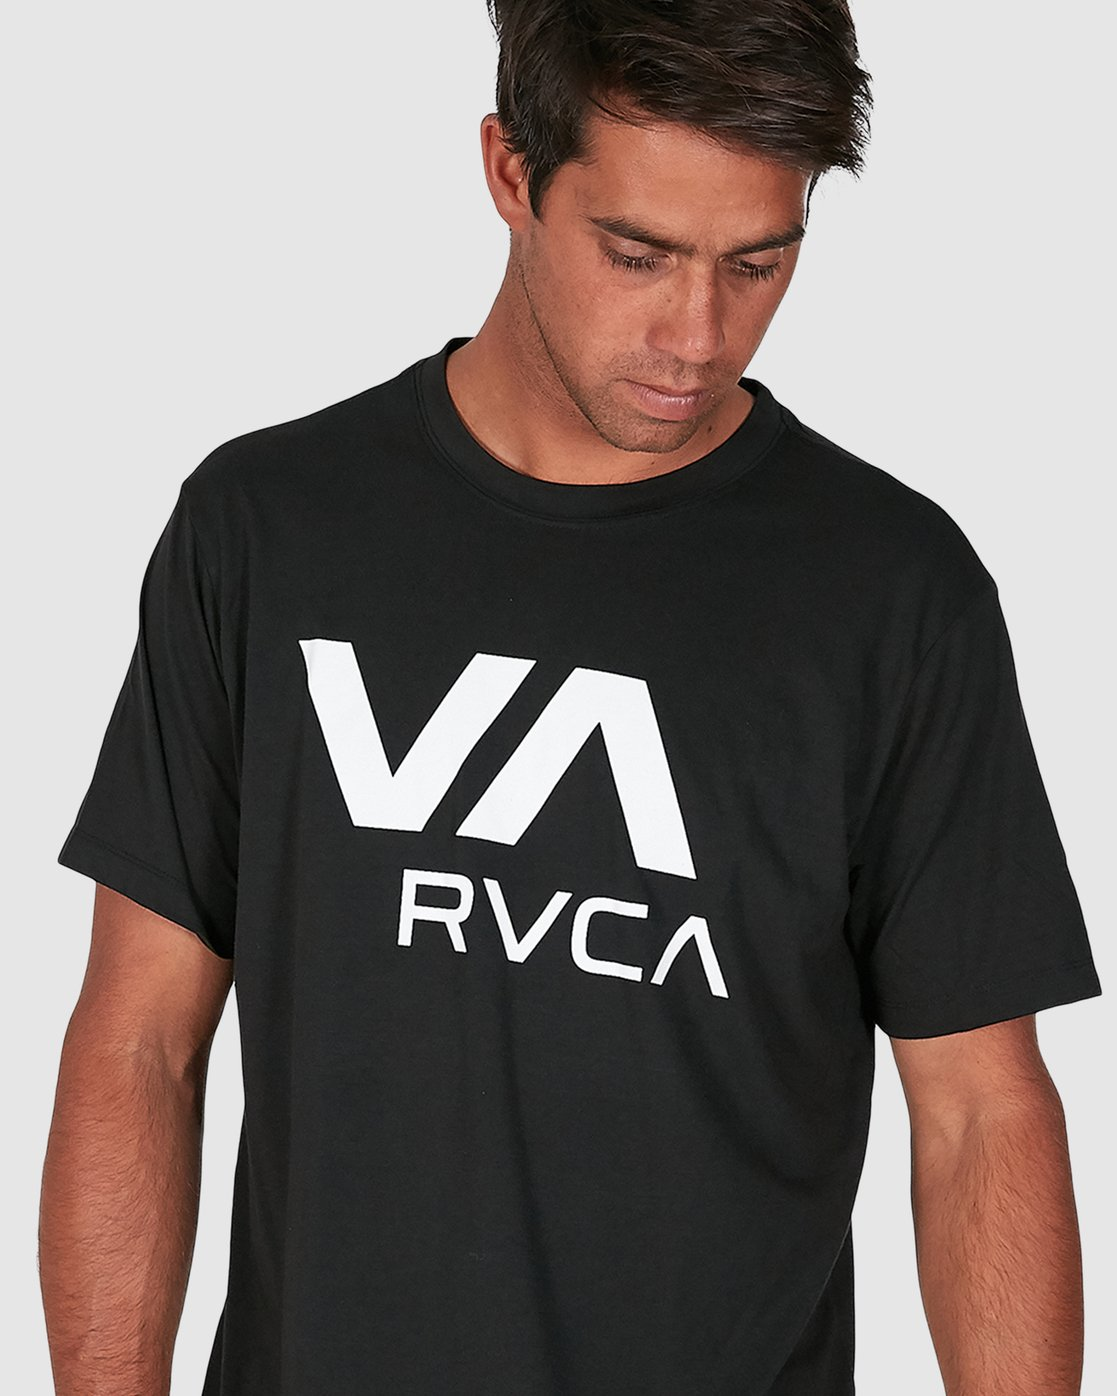 4 Va Rvca Short Sleeve Tee Black R305050 RVCA